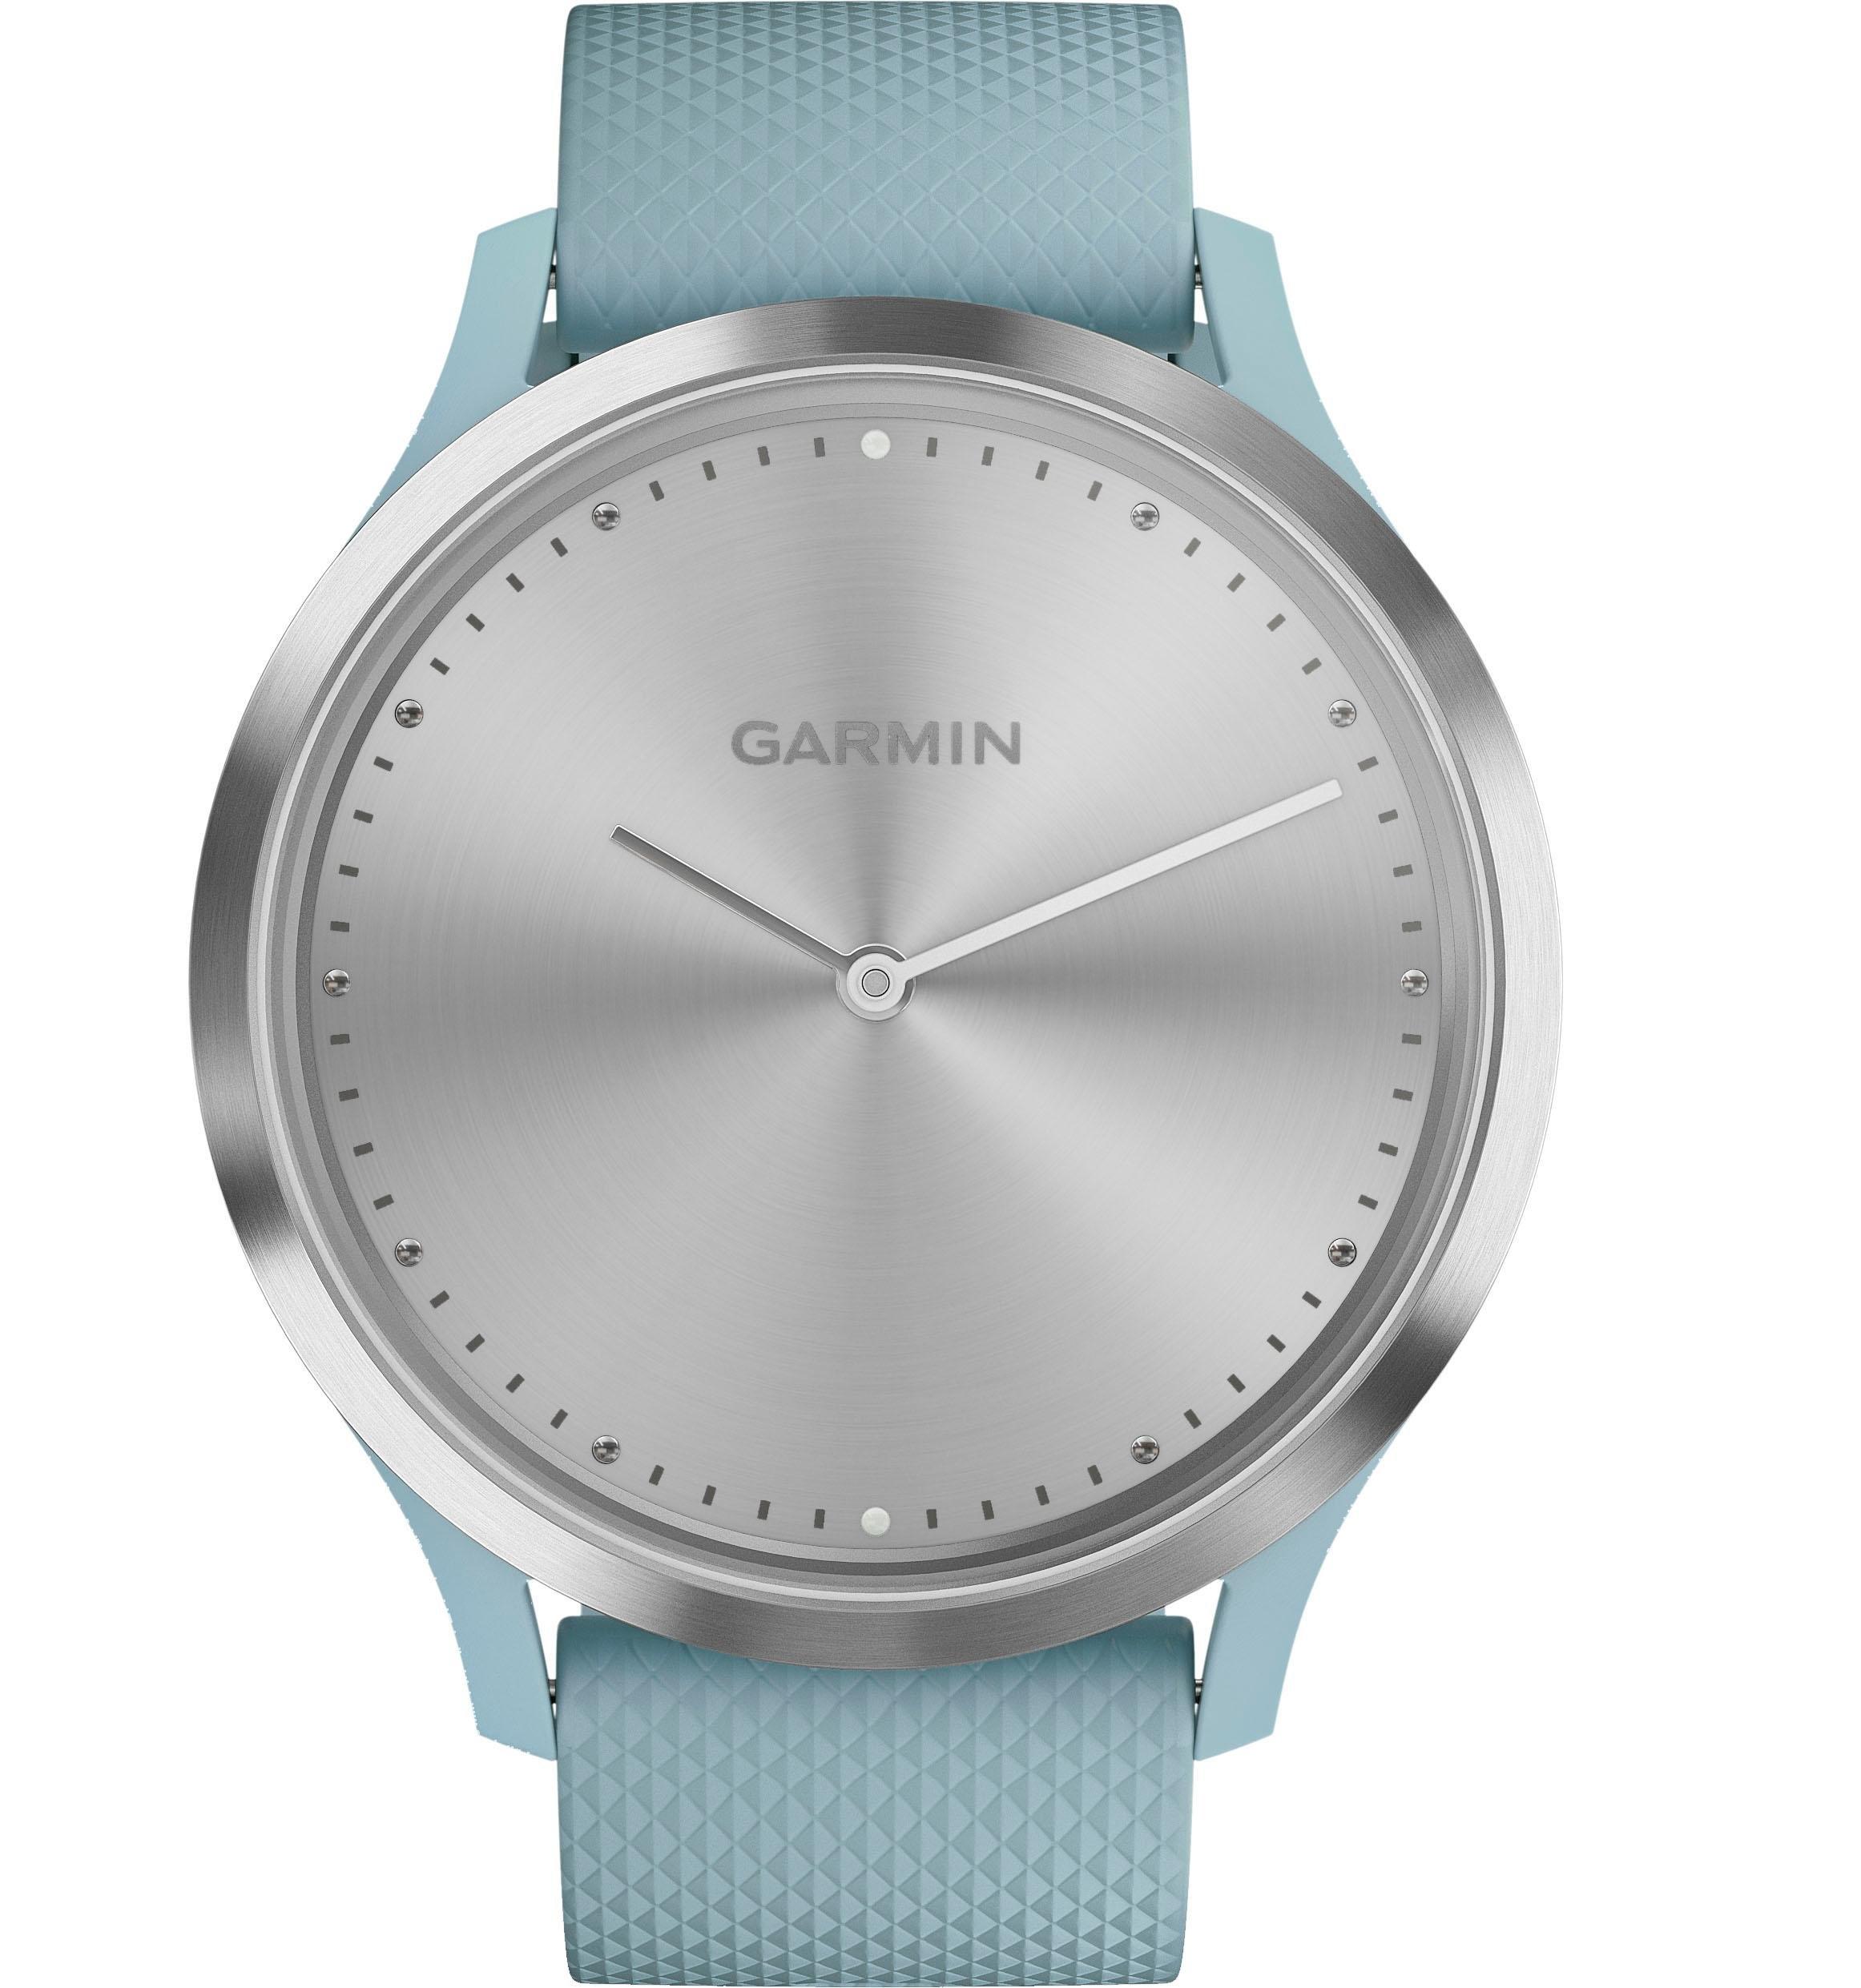 Garmin vivomove HR Sport (S/M) smartwatch (4,2 cm / 1,65 inch) nu online kopen bij OTTO